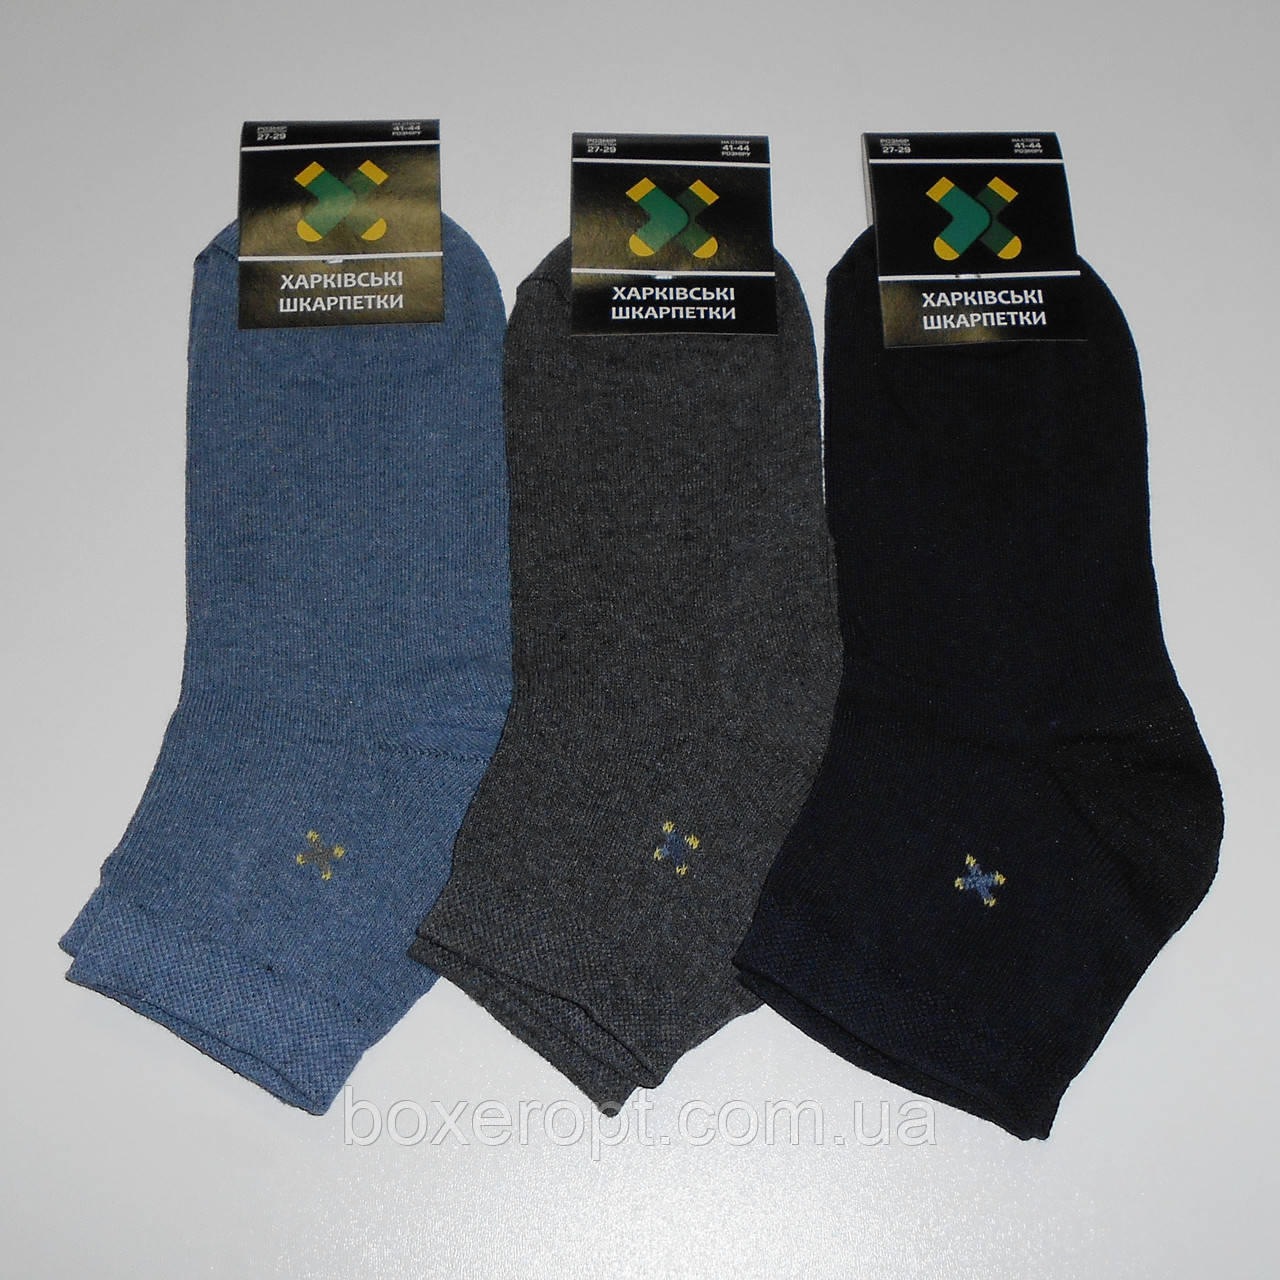 Мужские носки Comfort- 7.00 грн./пара (темное ассорти), фото 1